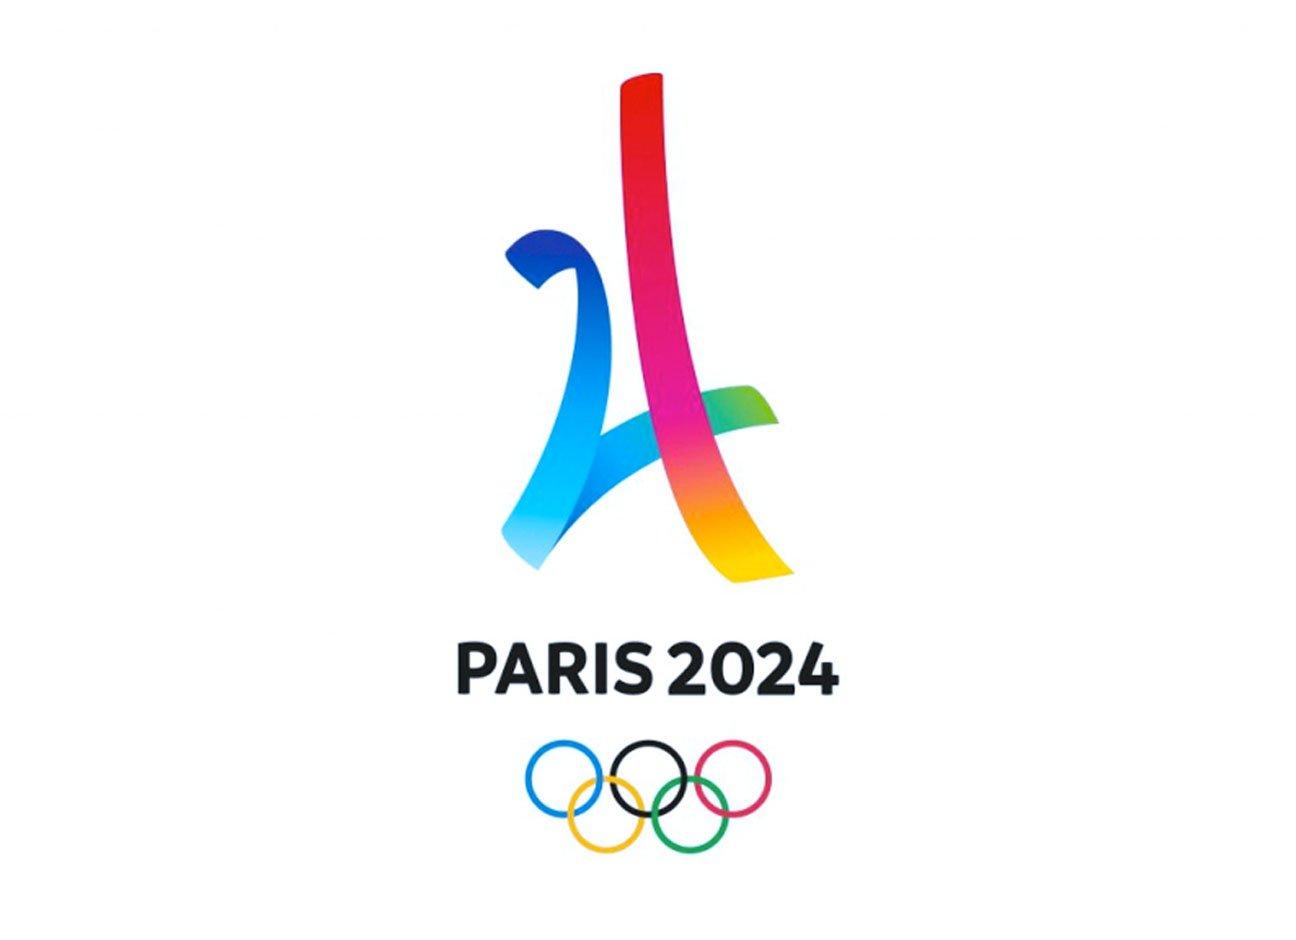 Paris 2024 Olympics Logo